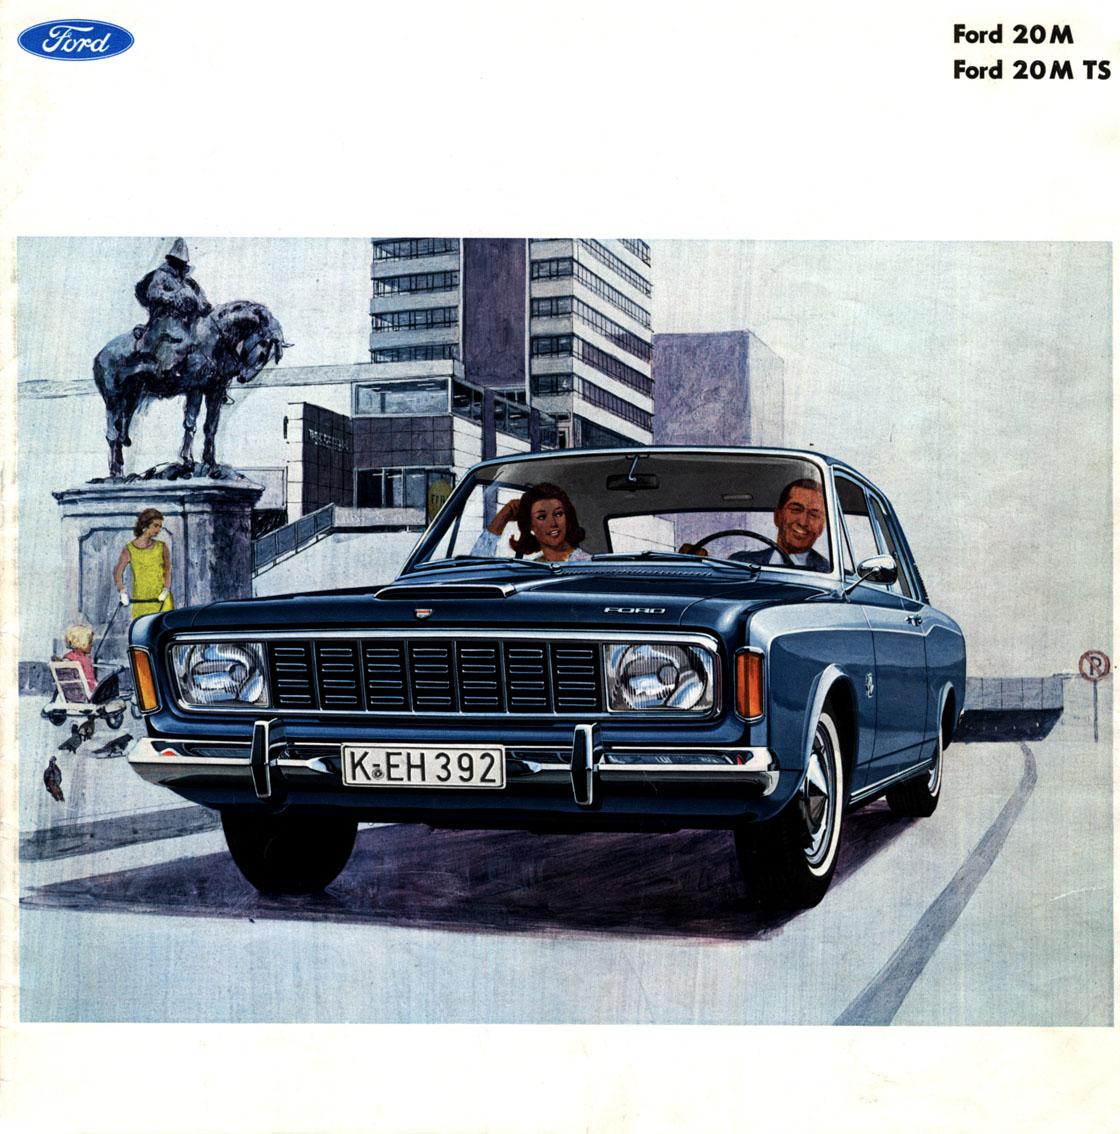 1968 -1969 German Ford Taunus 20 M (TS) | pin by scann R & 1968 -1969 German Ford Taunus 20 M (TS) | pin by scann R | CAR ... markmcfarlin.com